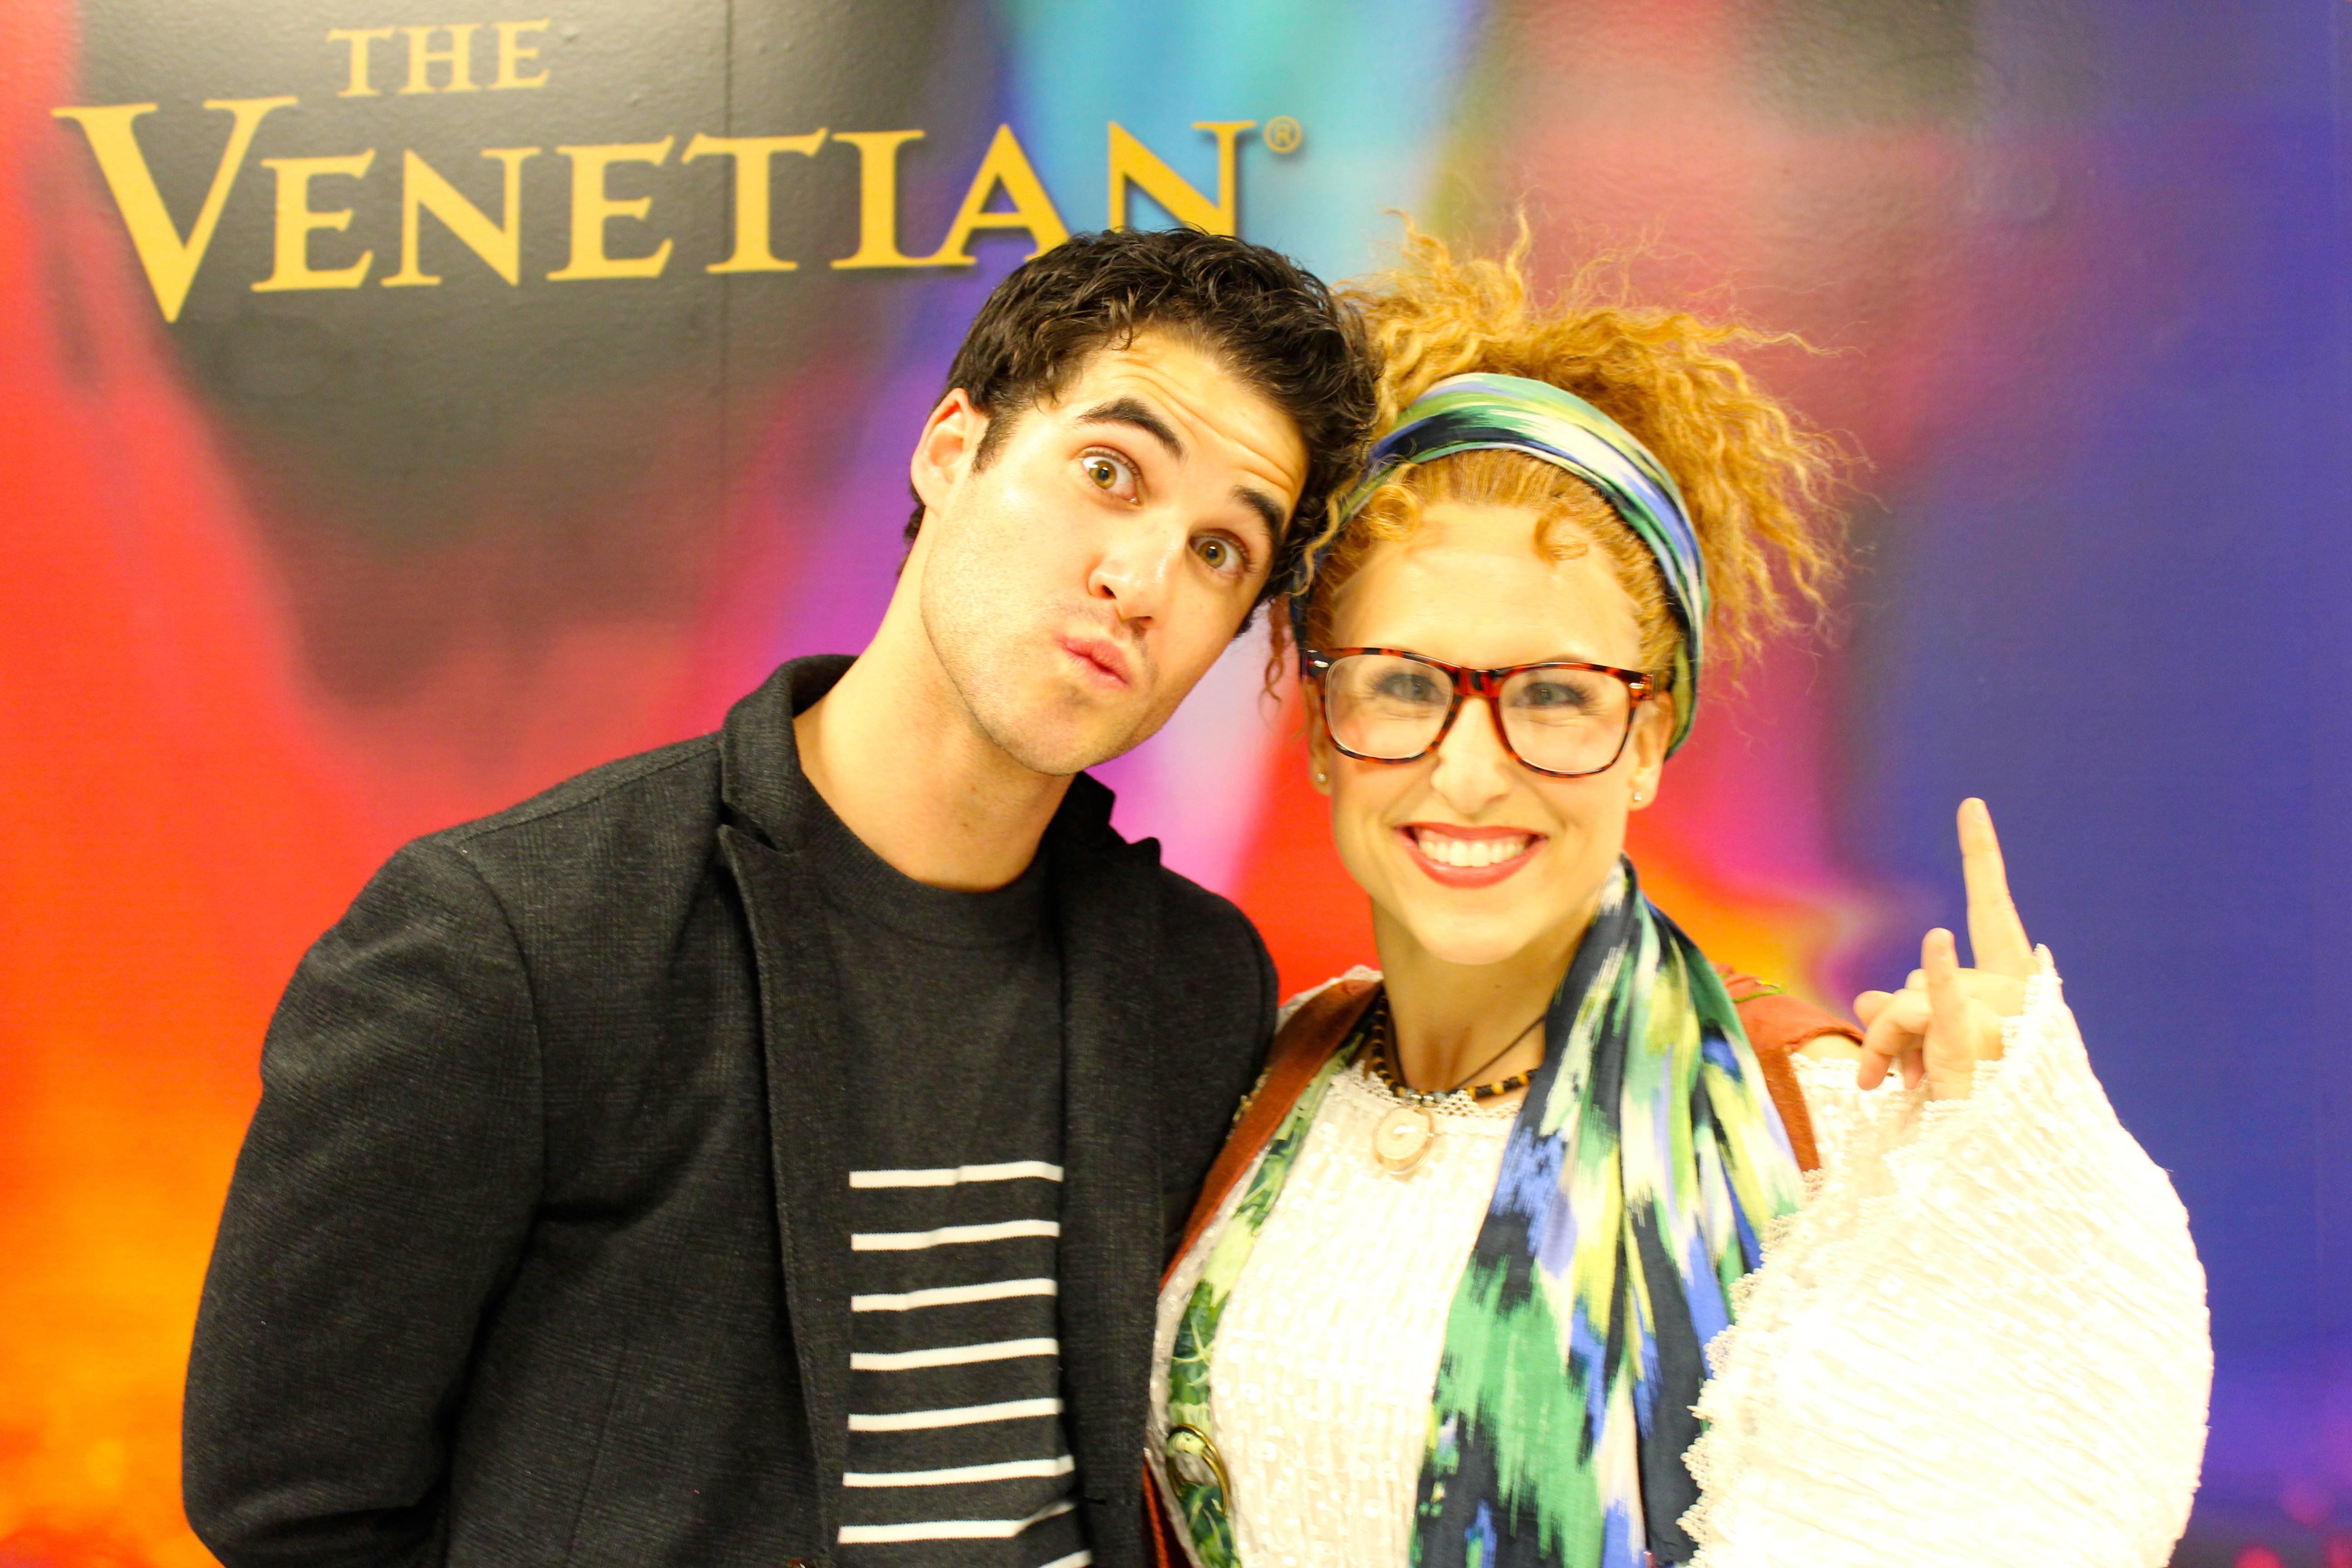 Darren Criss with Tiffany Engen